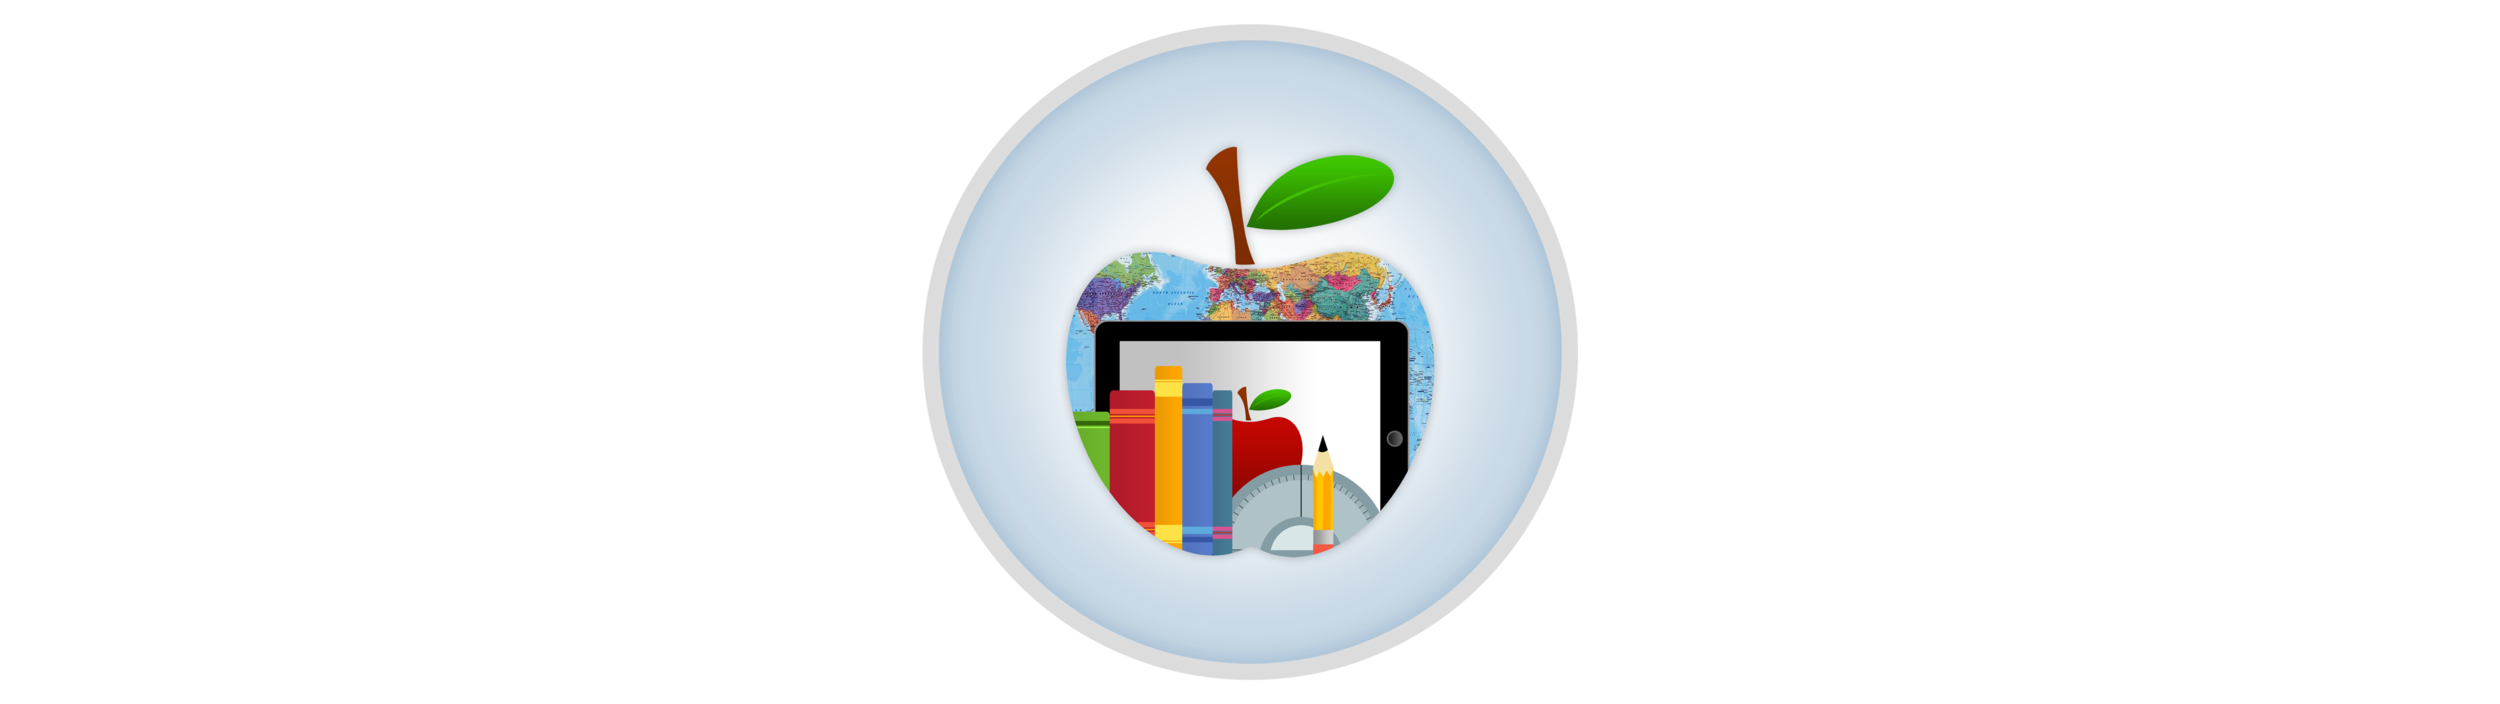 apple-tree-learning-center-glendale-news-01.png